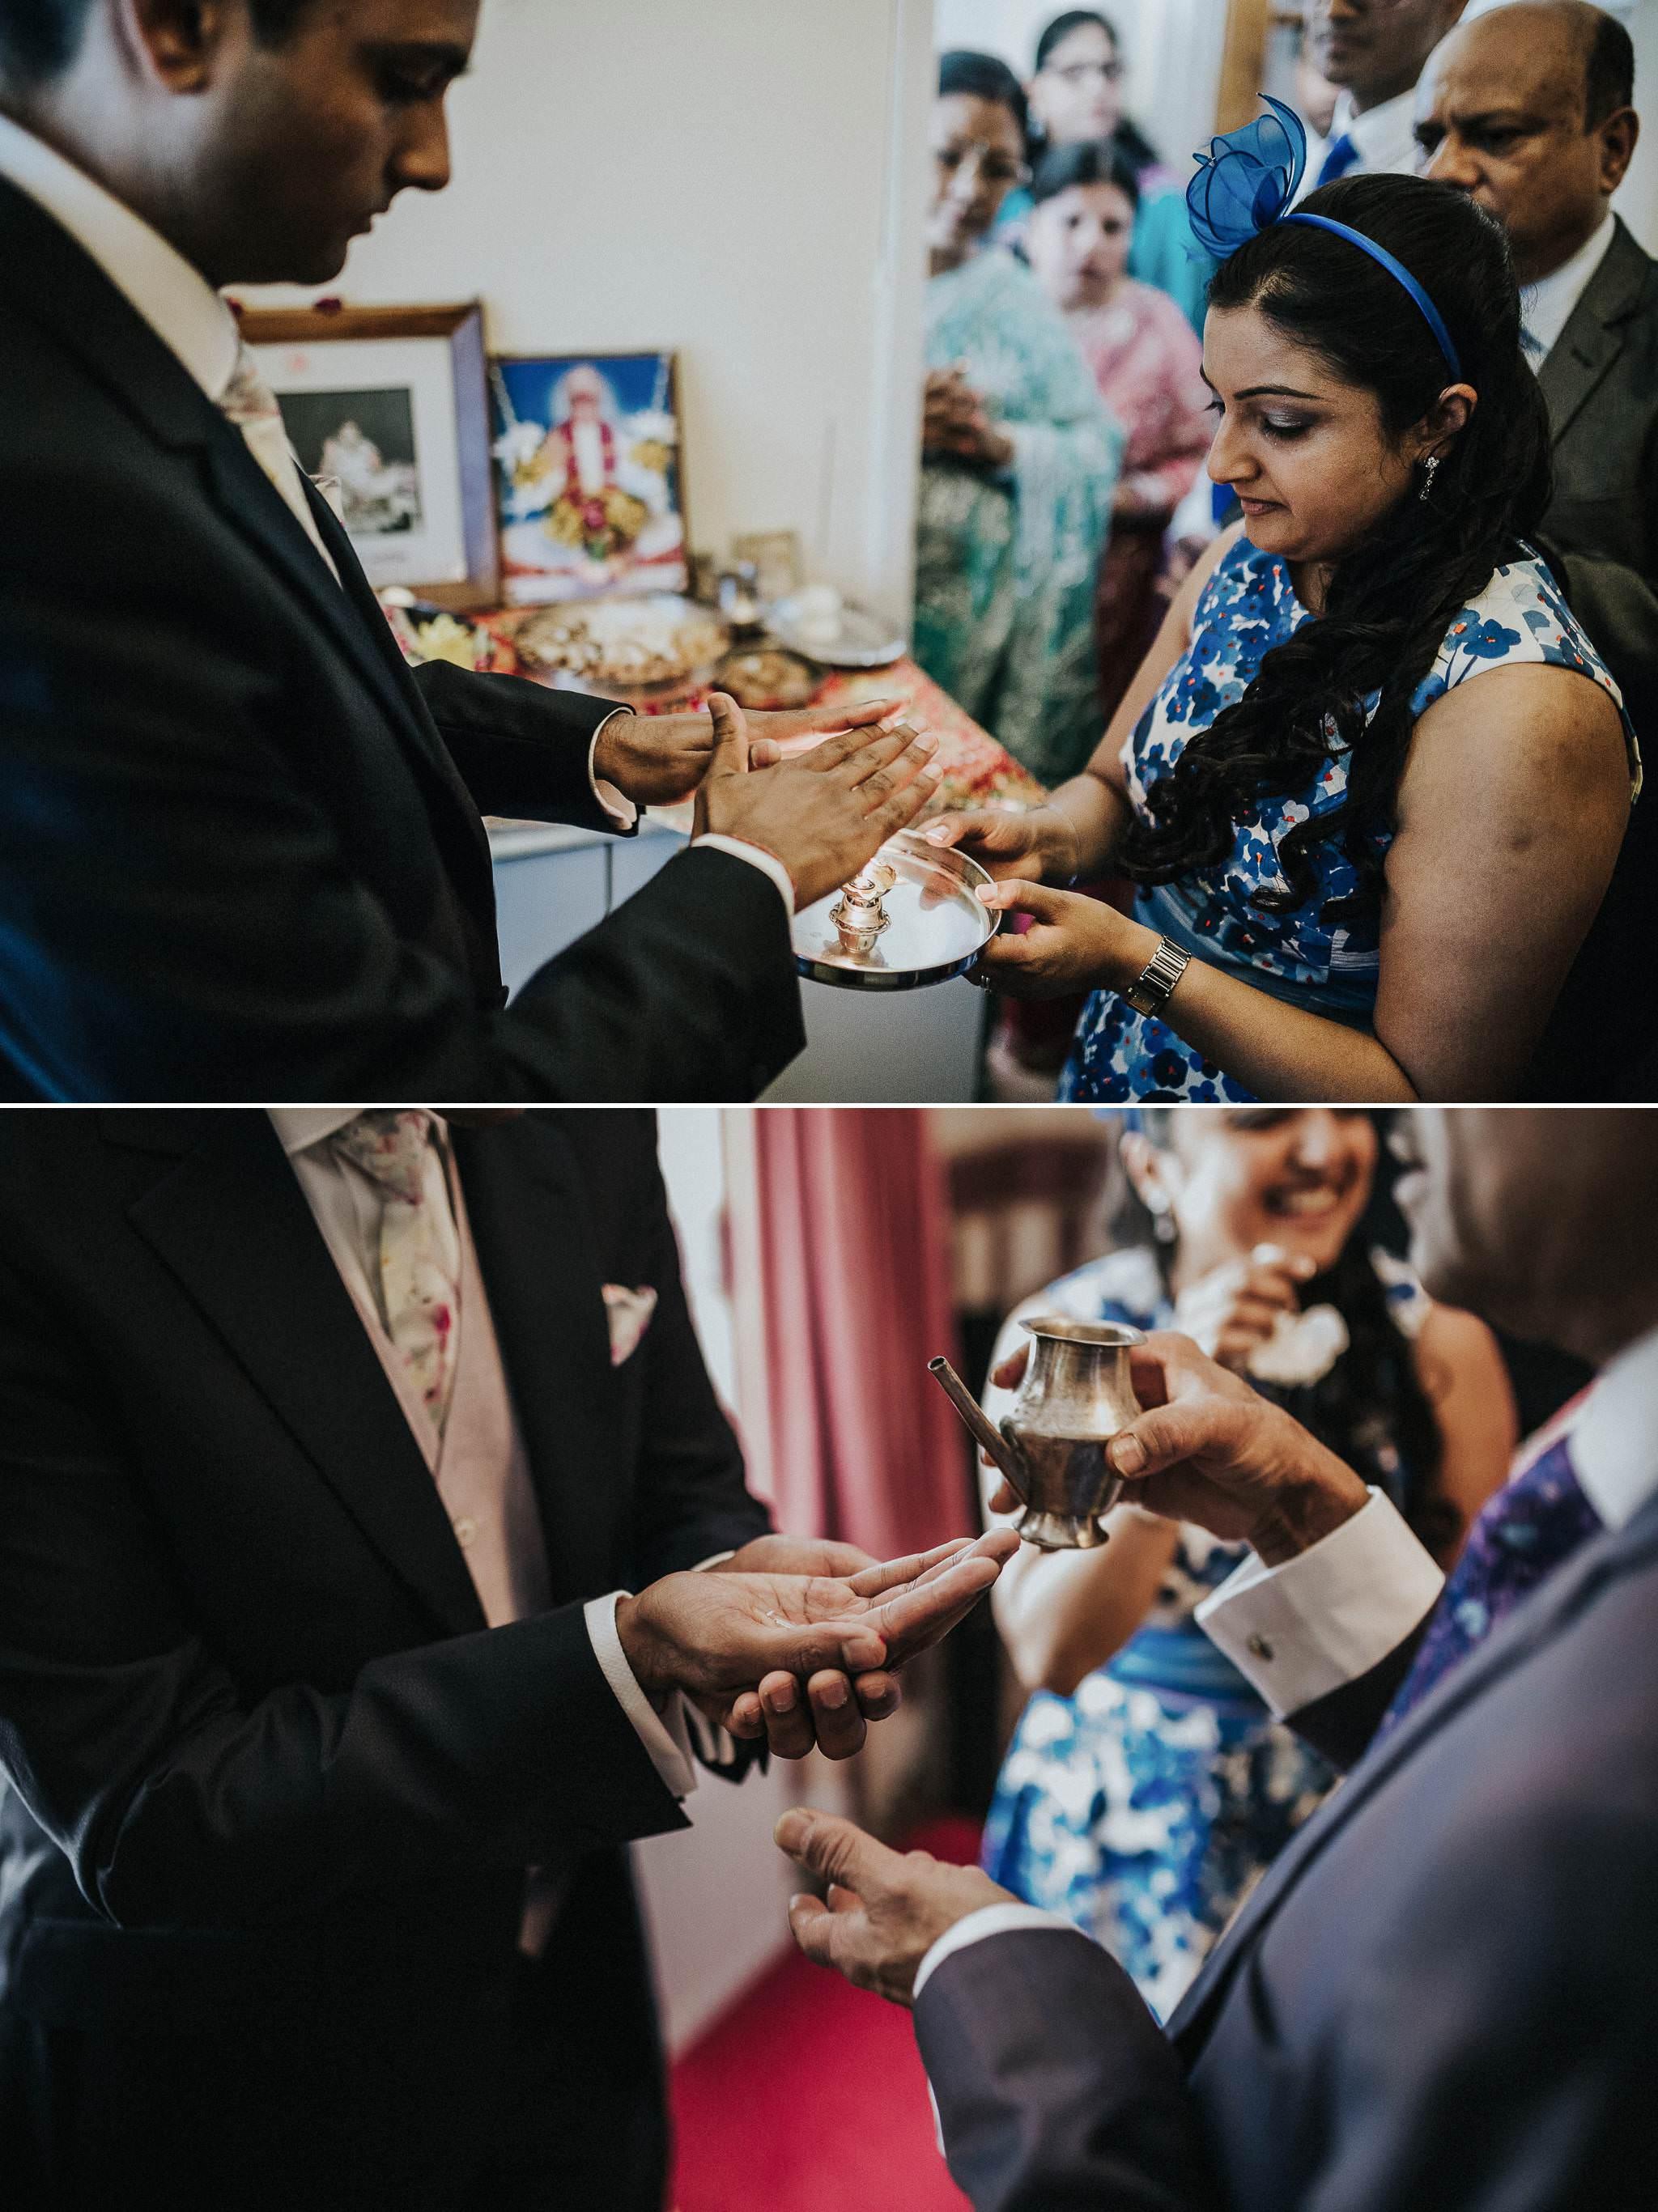 compton-verney-wedding-photos 2.jpg